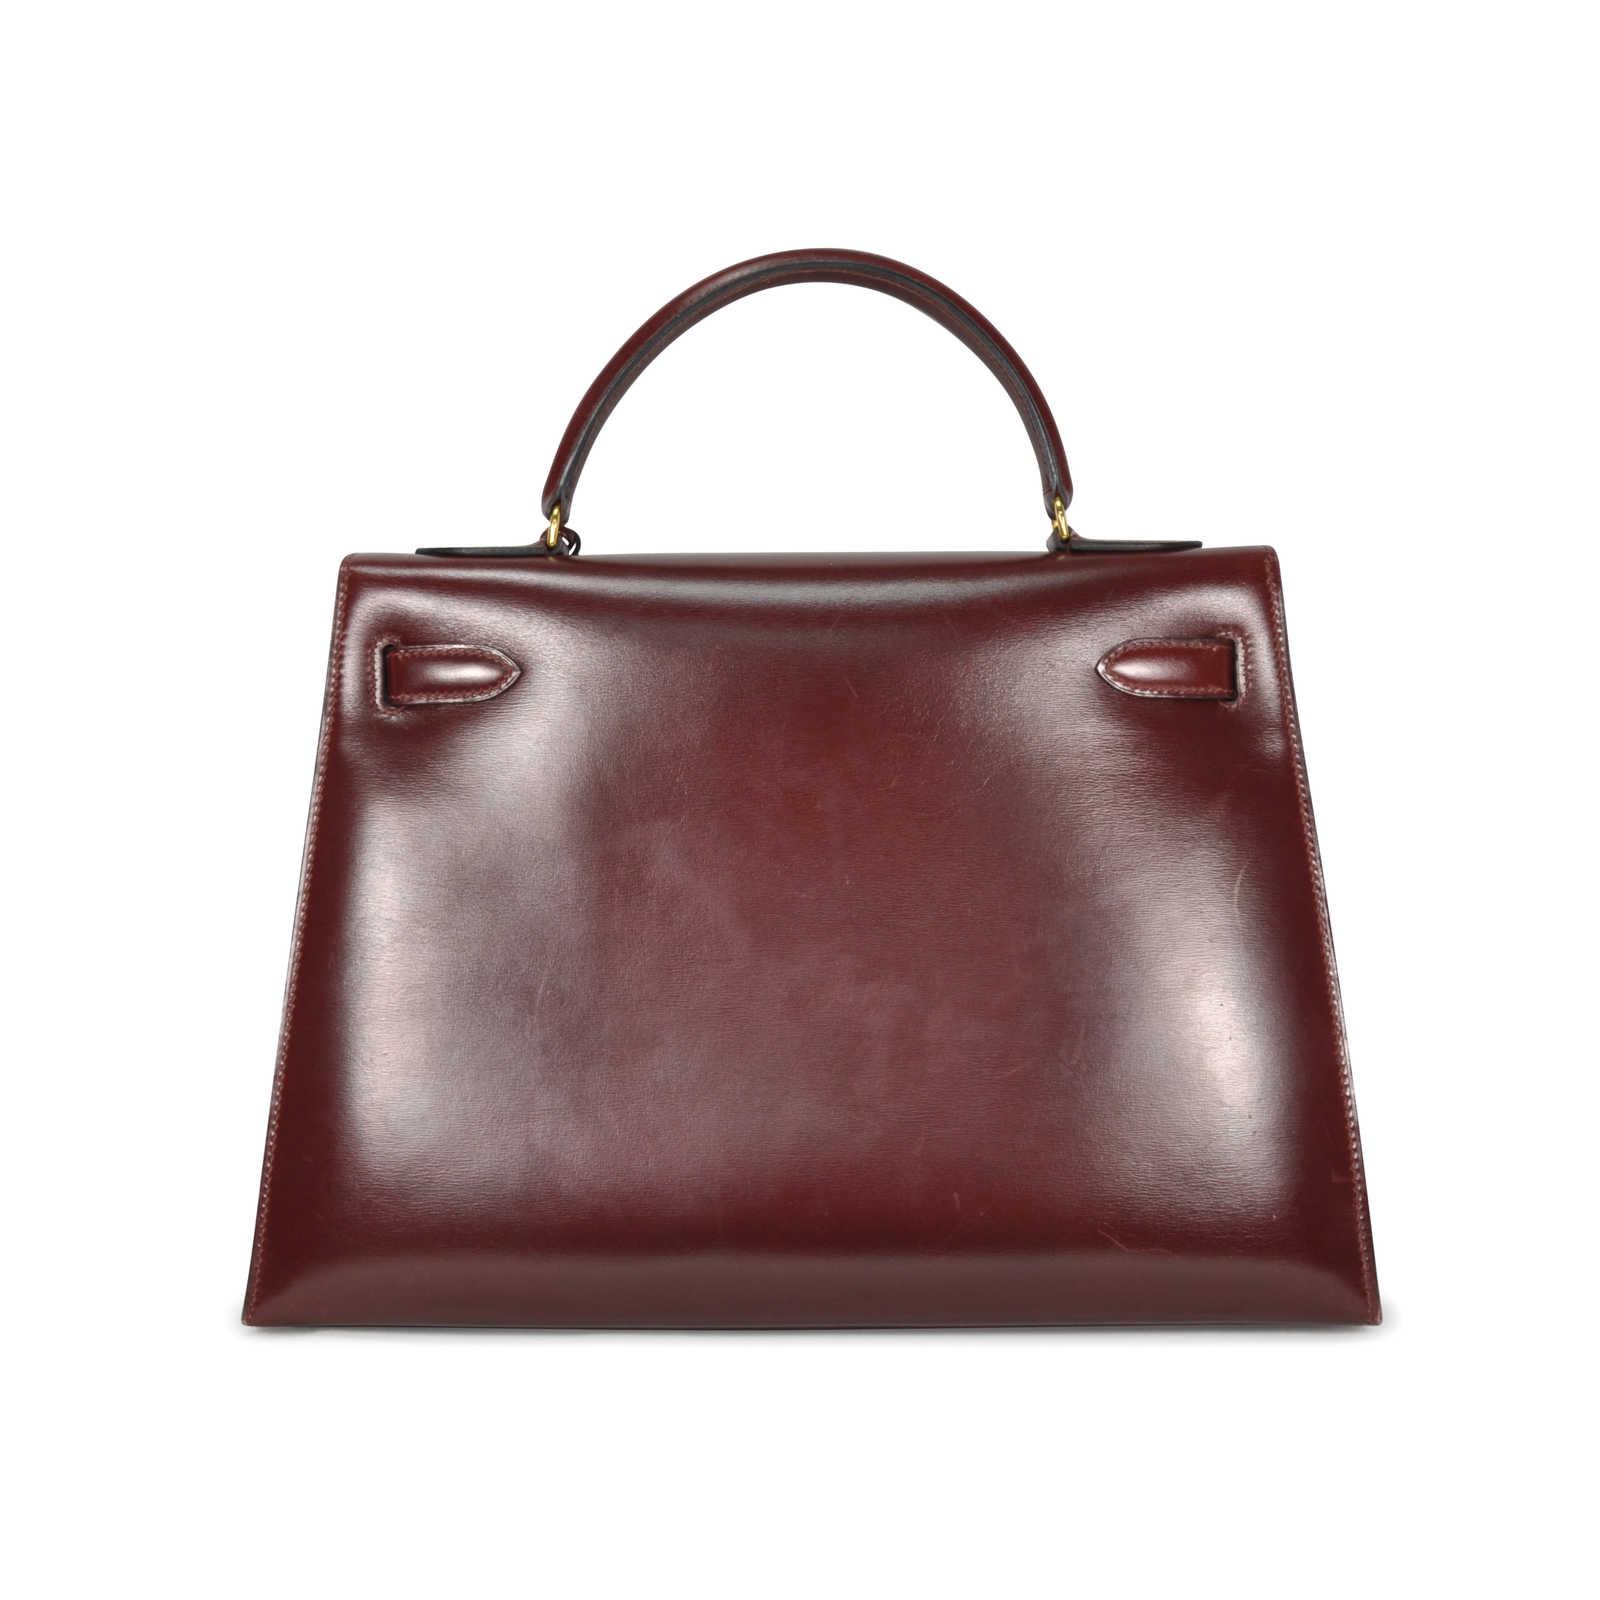 b877719487c3 ... Authentic Vintage Hermès Burgundy Box Kelly 32 (TFC-107-00036) -  Thumbnail ...